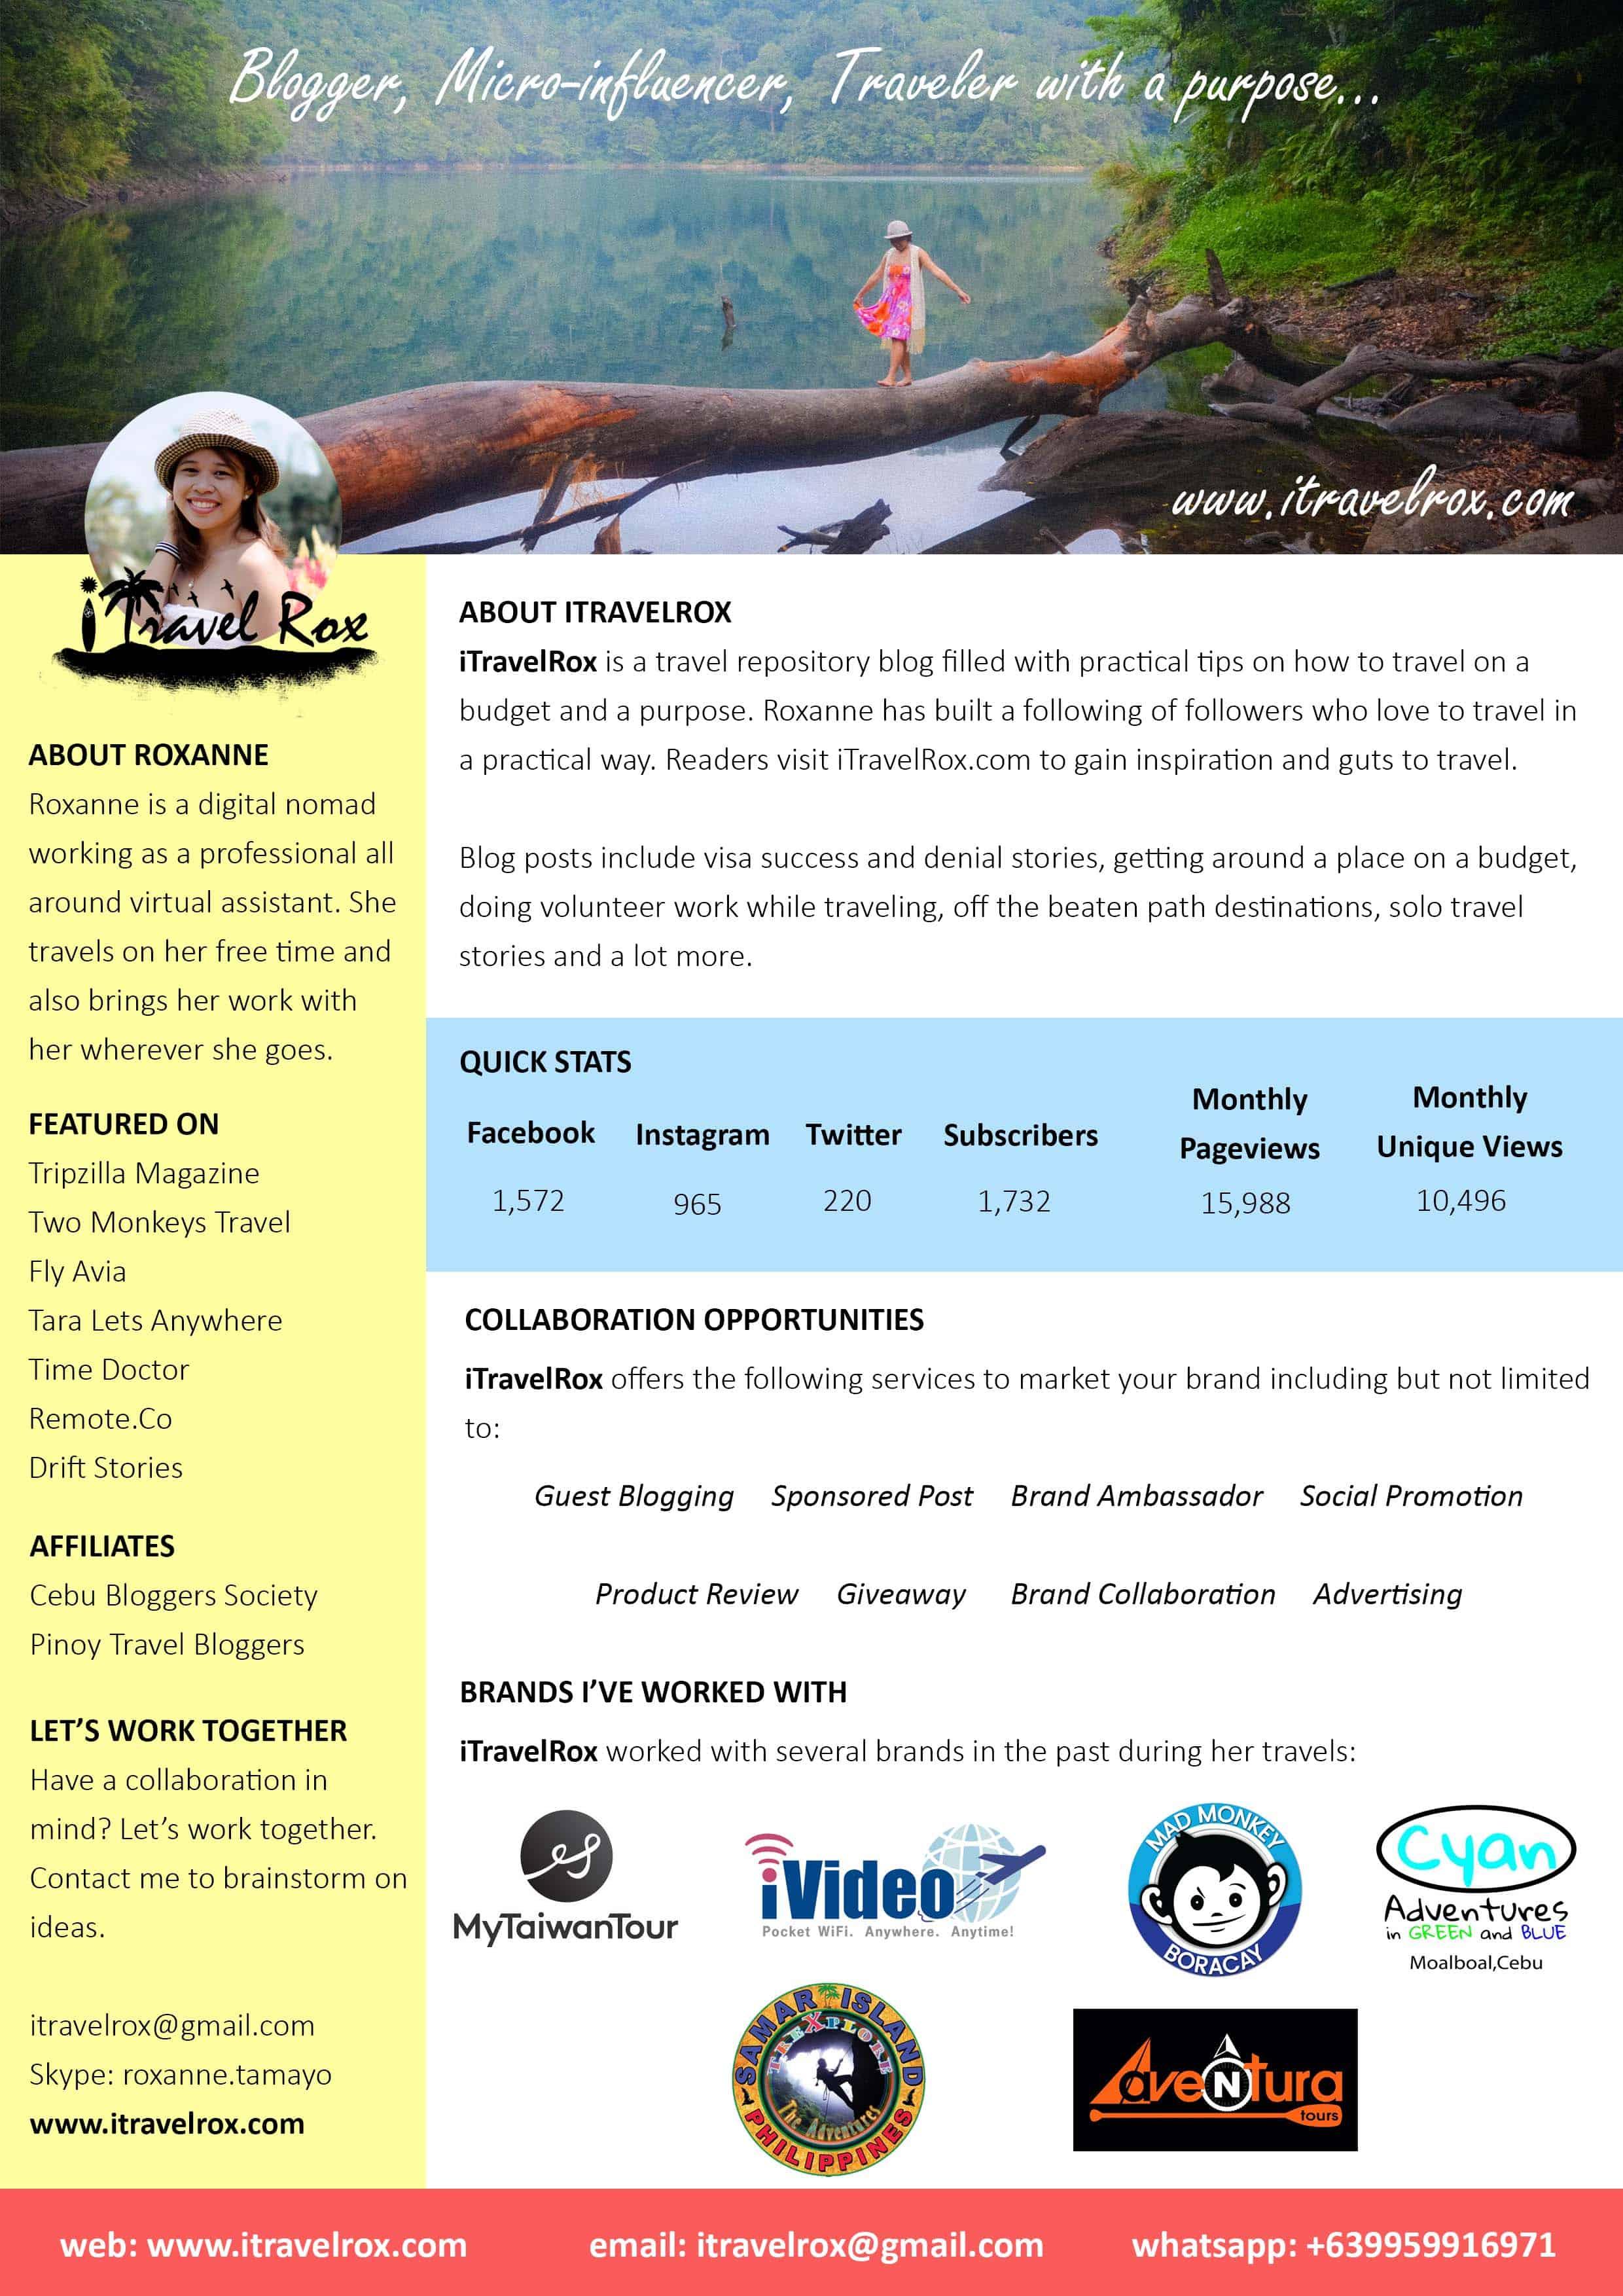 itravelrox social media kit